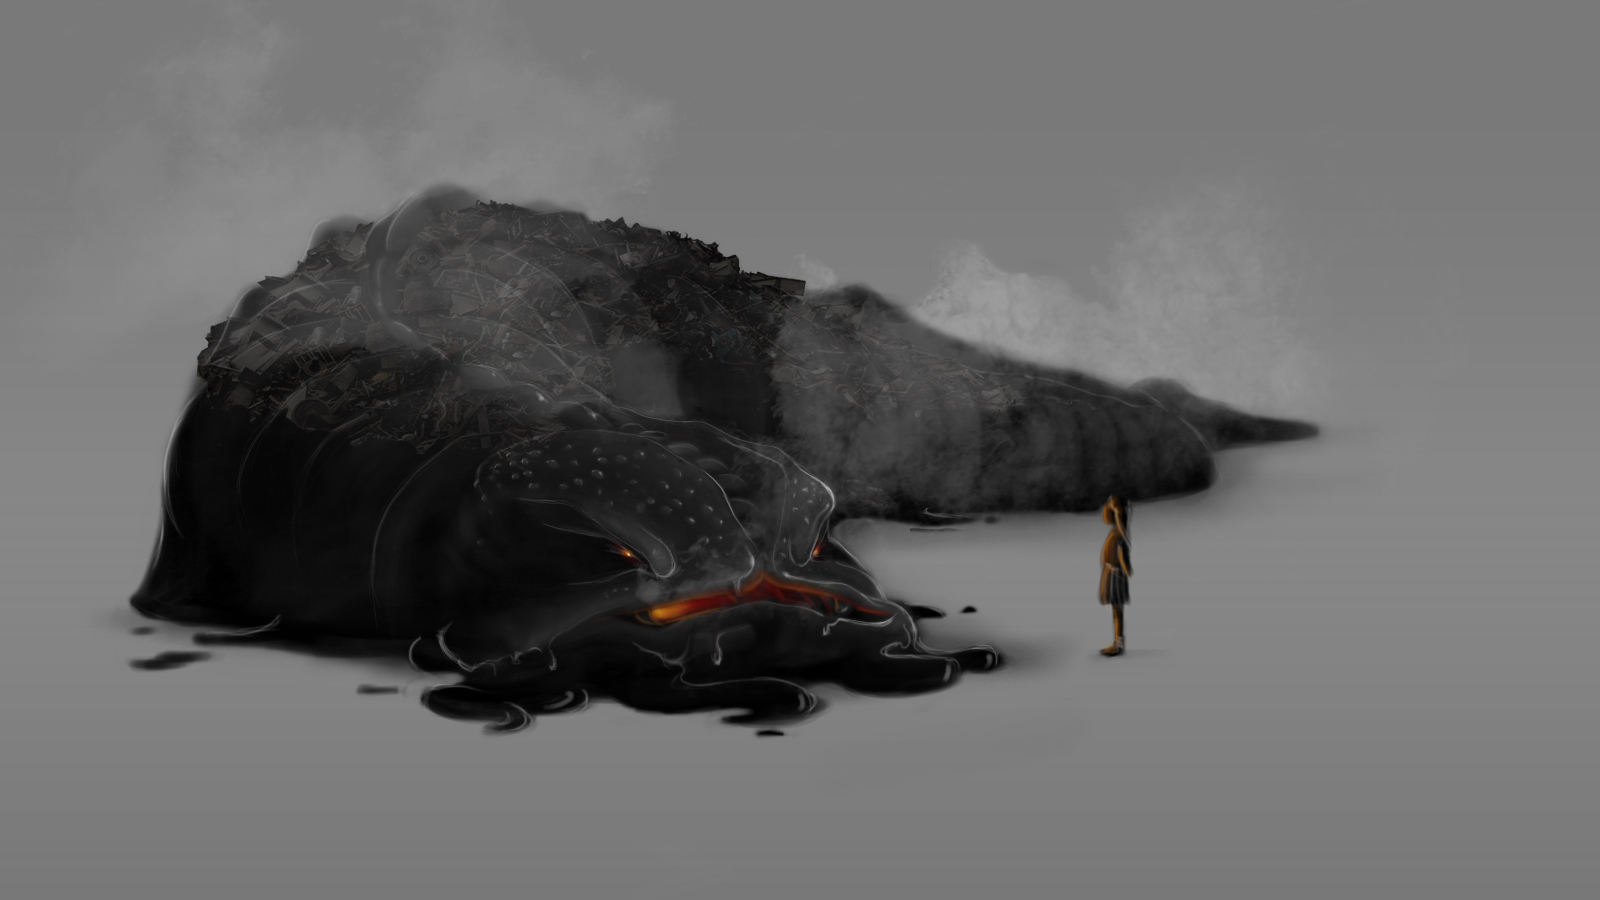 Kune-cortometraje-monstruo-2